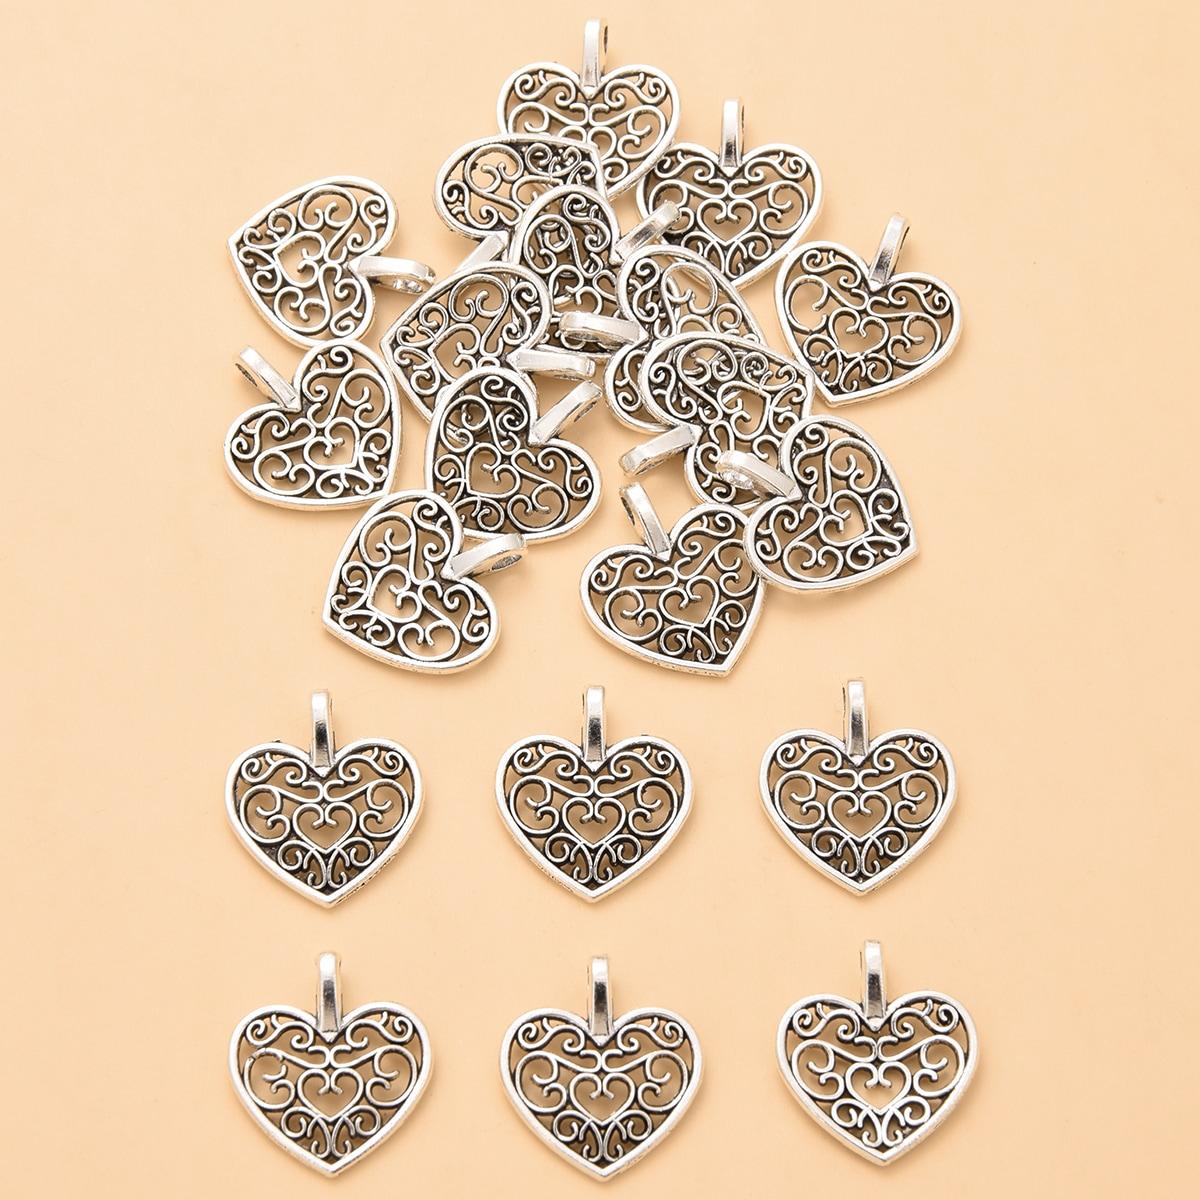 20pcs Heart Design Pendant